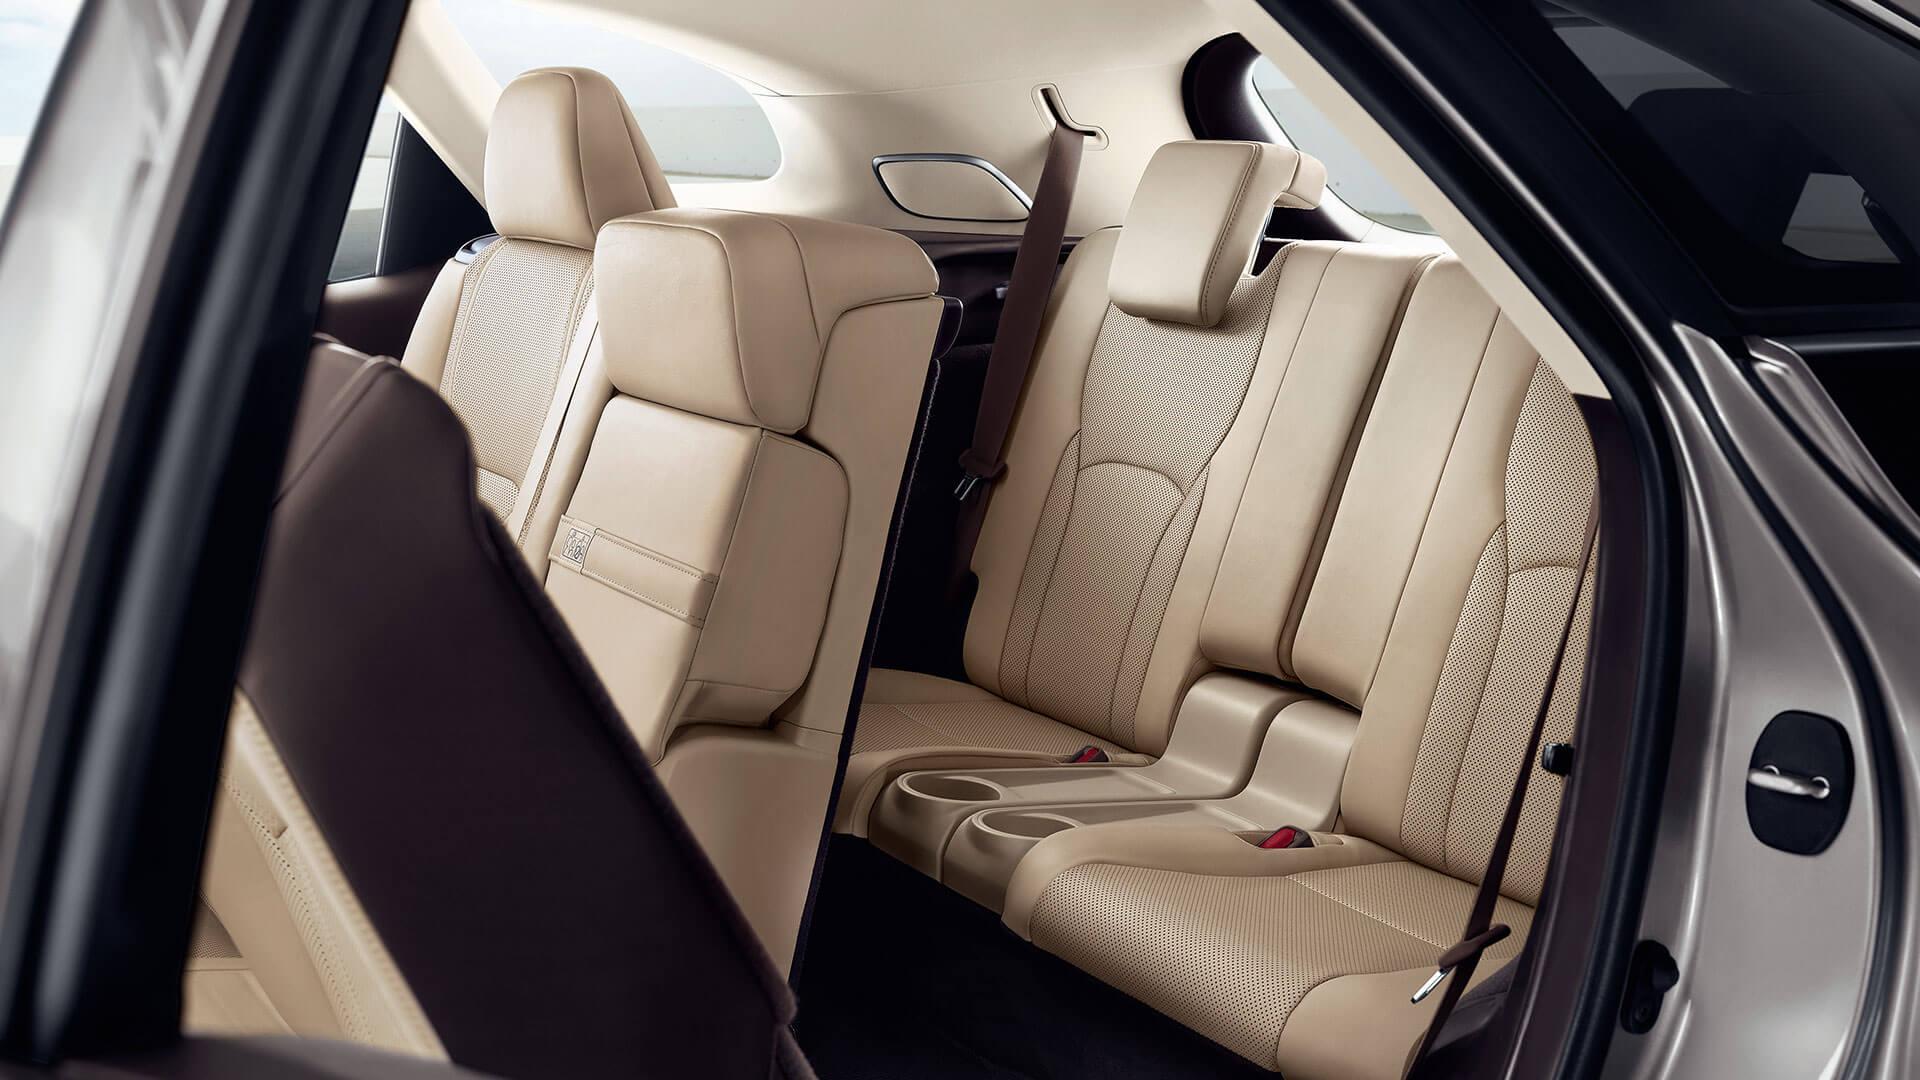 Nuevo Lexux RX 450h L (7 Plazas) 4